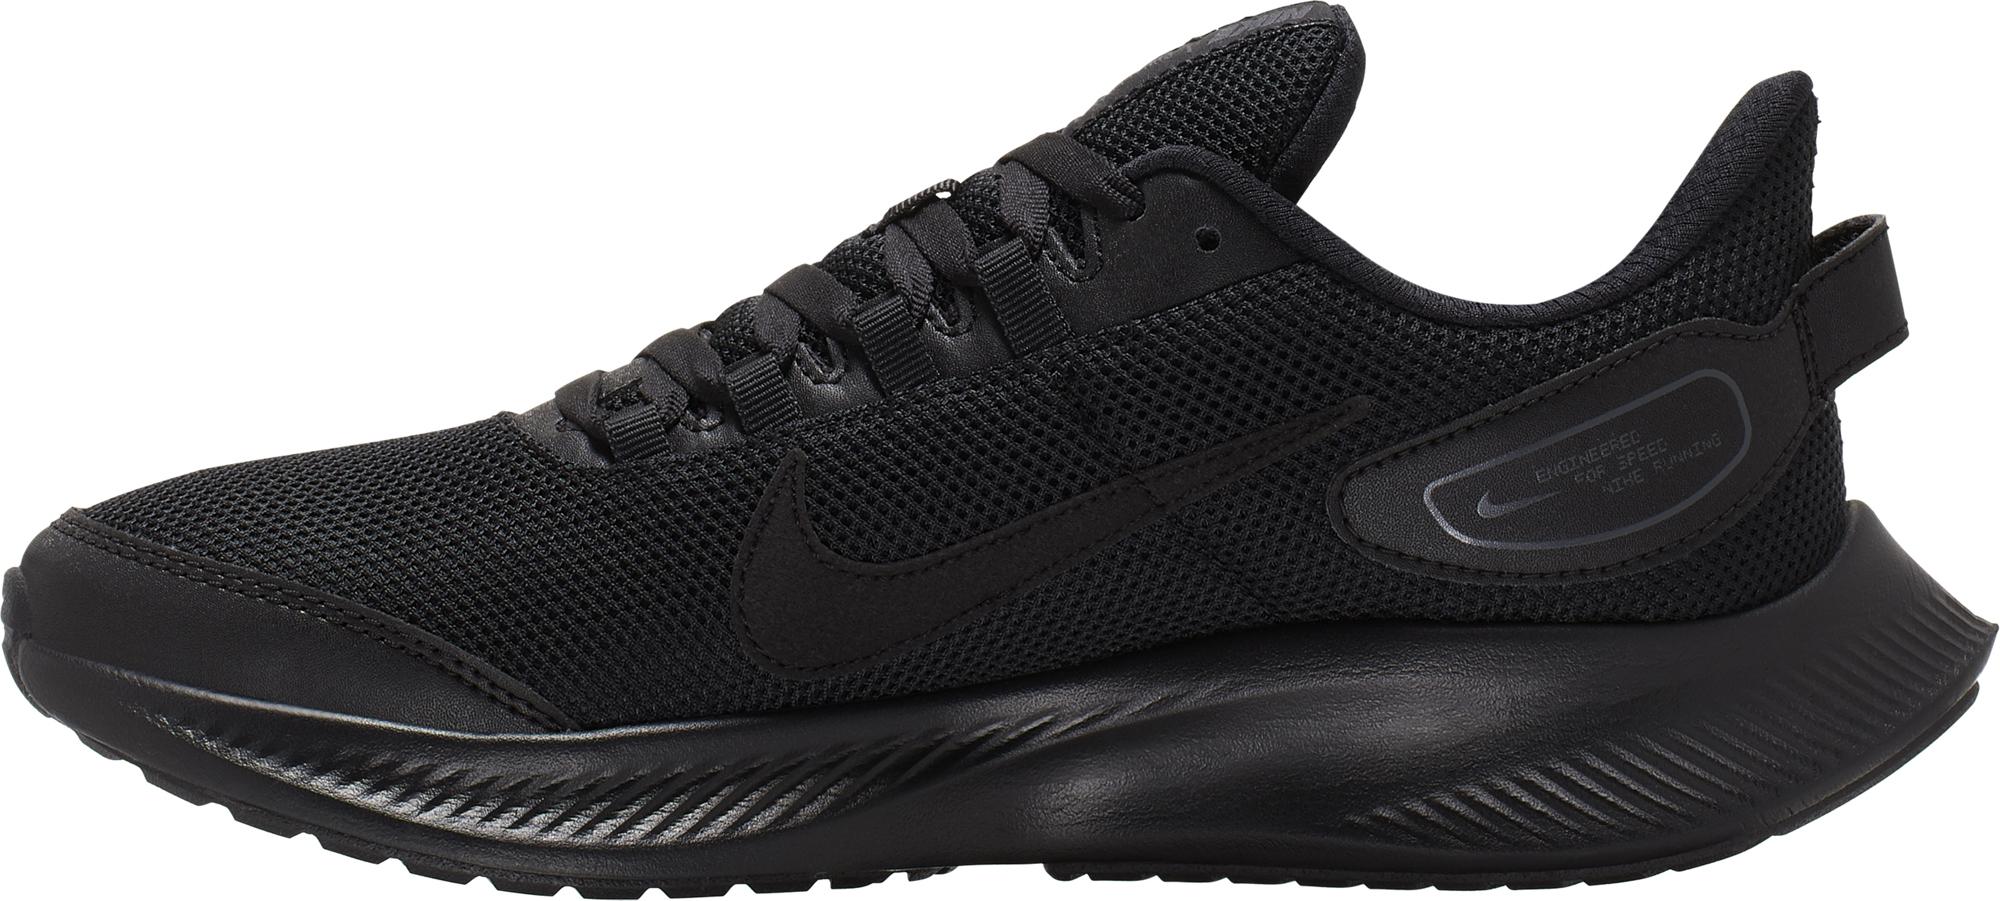 Nike Кроссовки женские Run All Day 2, размер 37